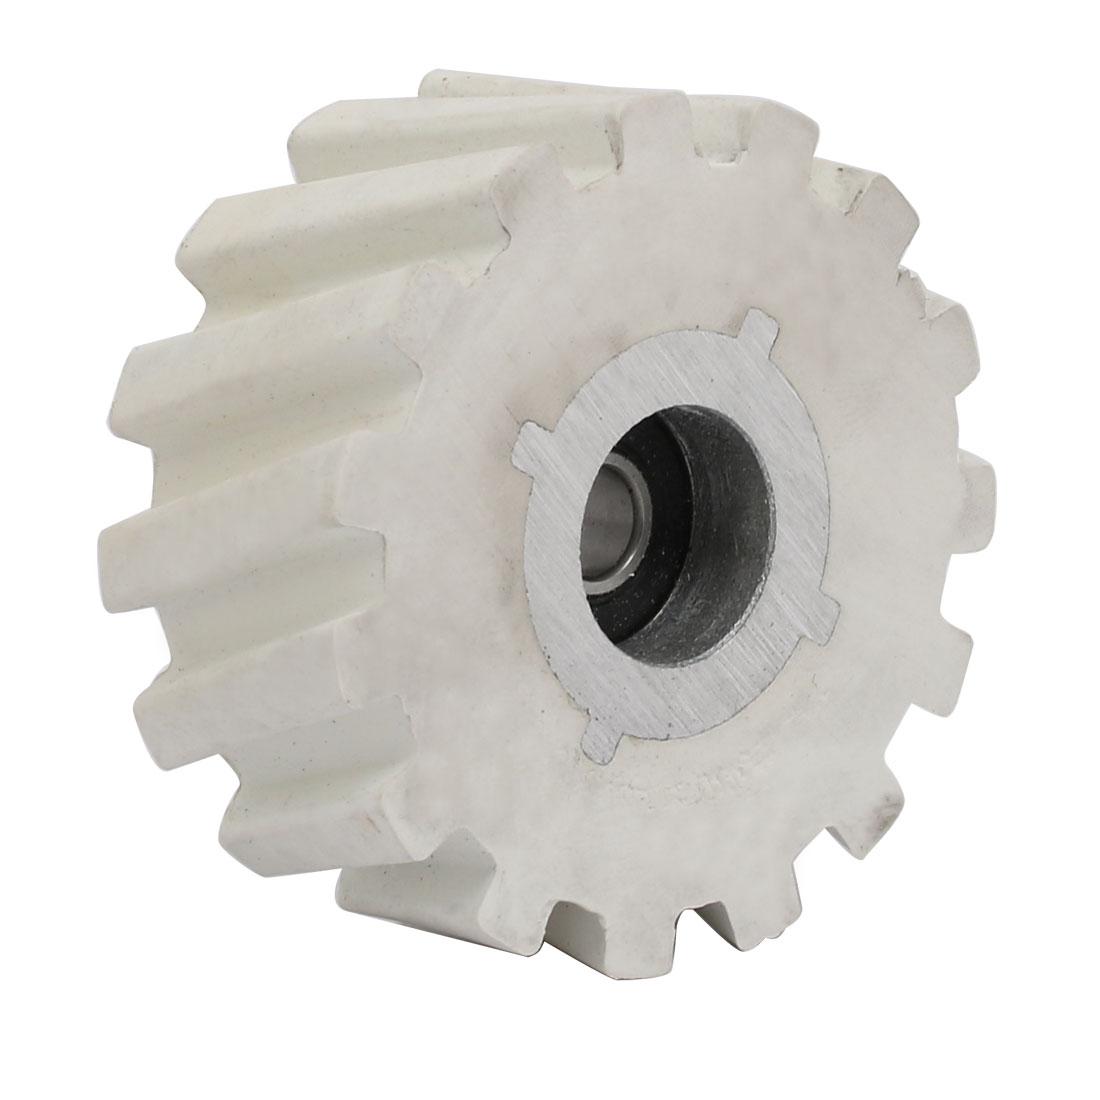 65mmx8mmx28mm Bearing Steel Rubber Pinch Roller Edgebanding Wheel Pulley White